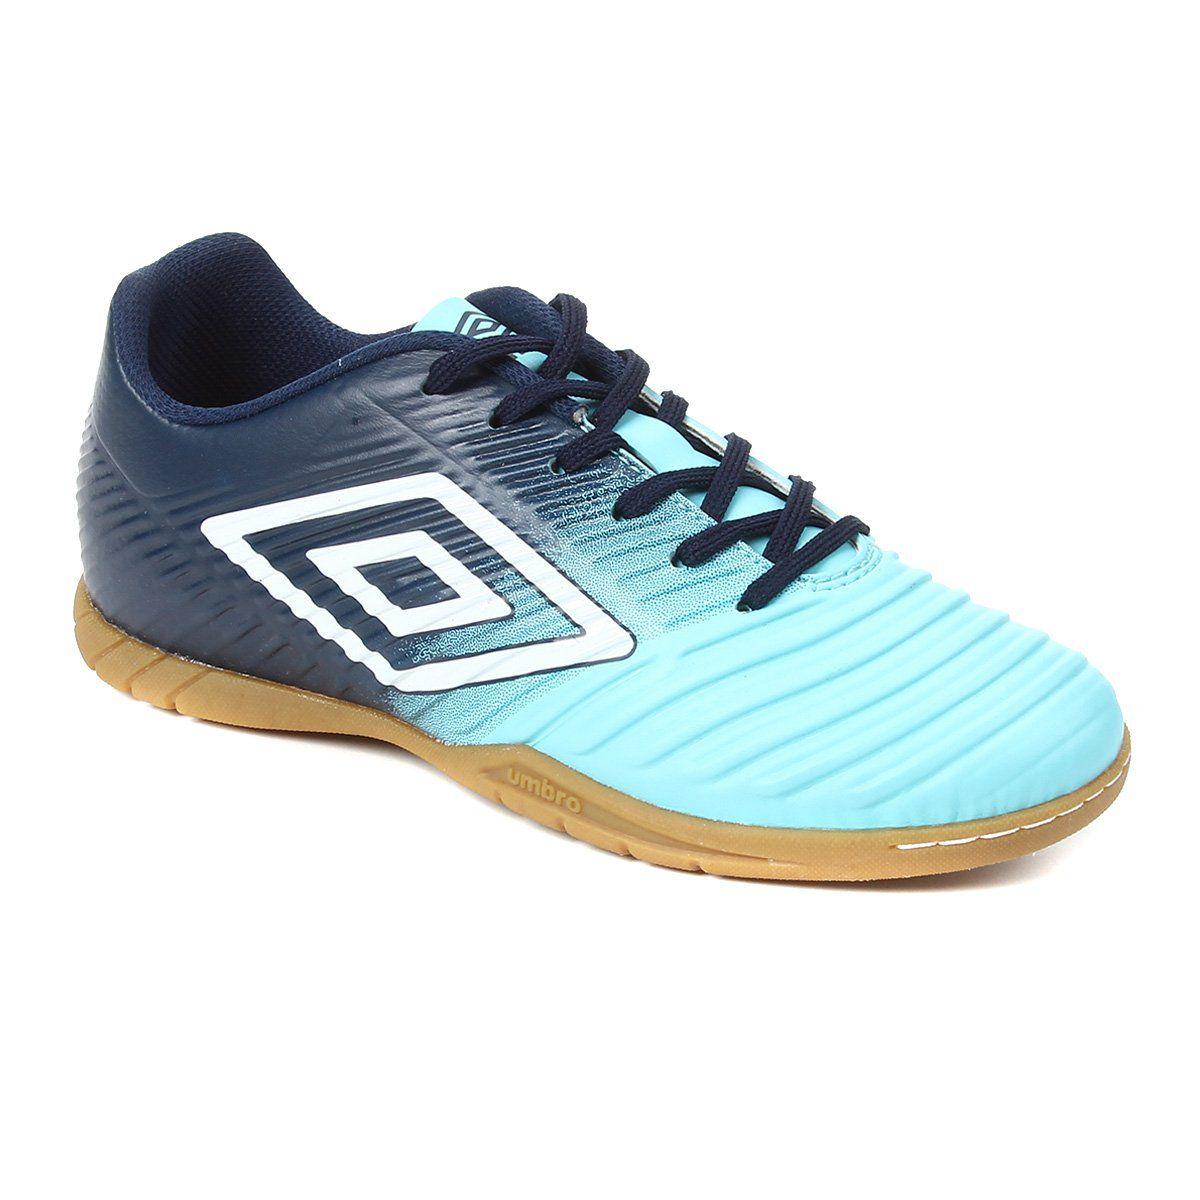 Chuteira Futsal Umbro Fifty III Masculino - Azul/Marinho